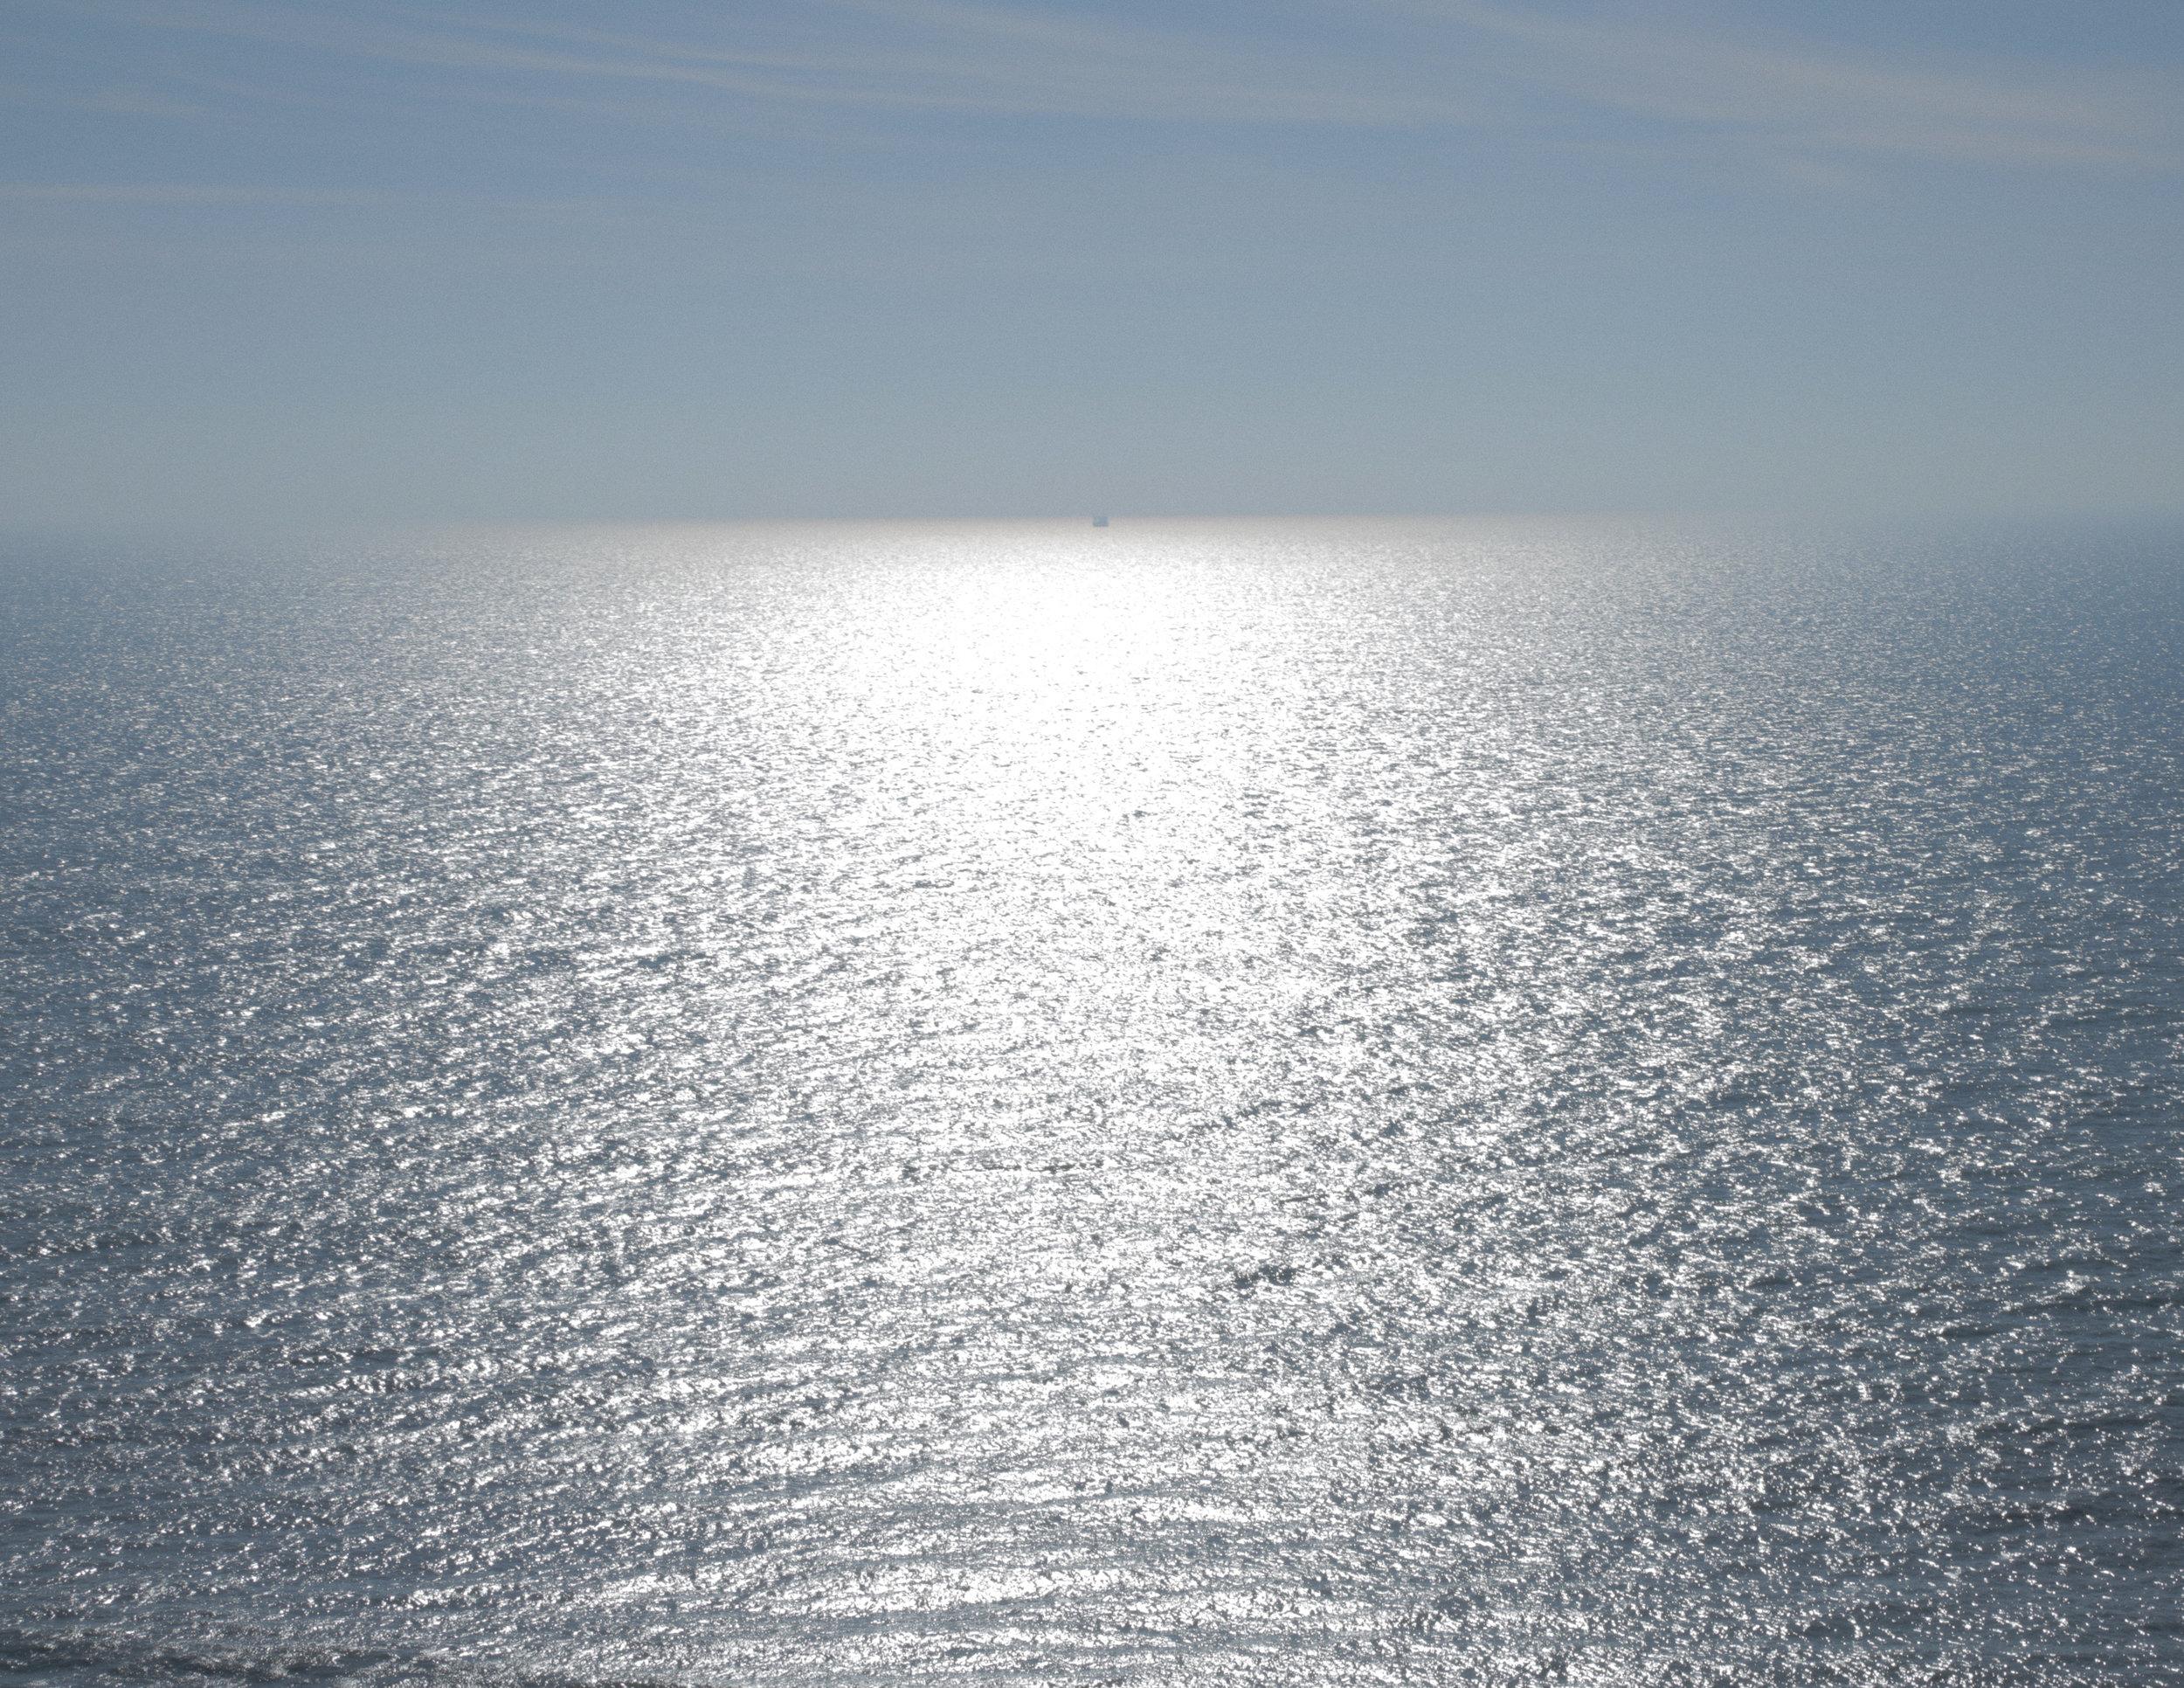 Samana, Samana music, Samana photography, The ocean